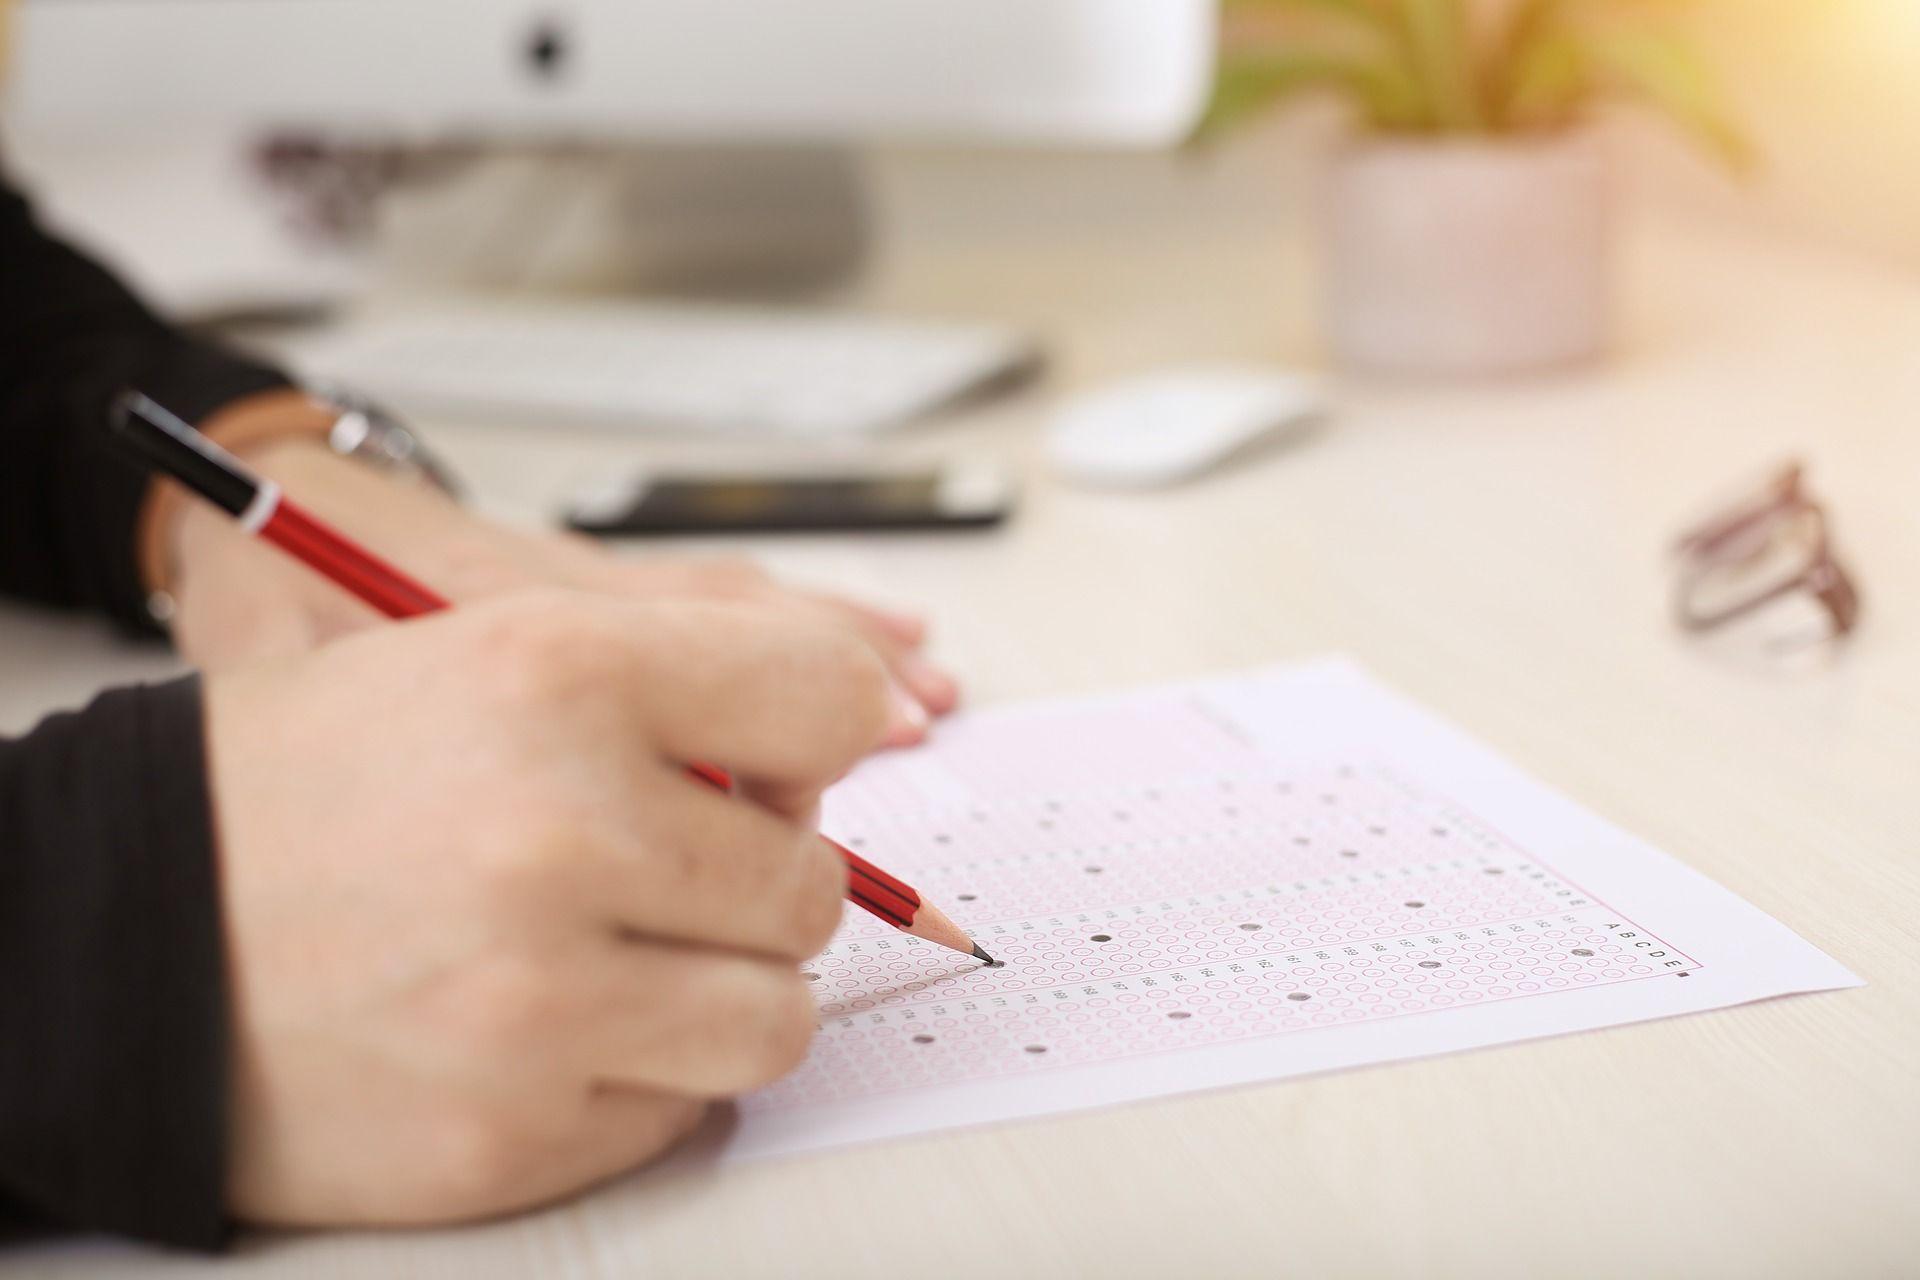 WSET 1 practice exam multiple choice